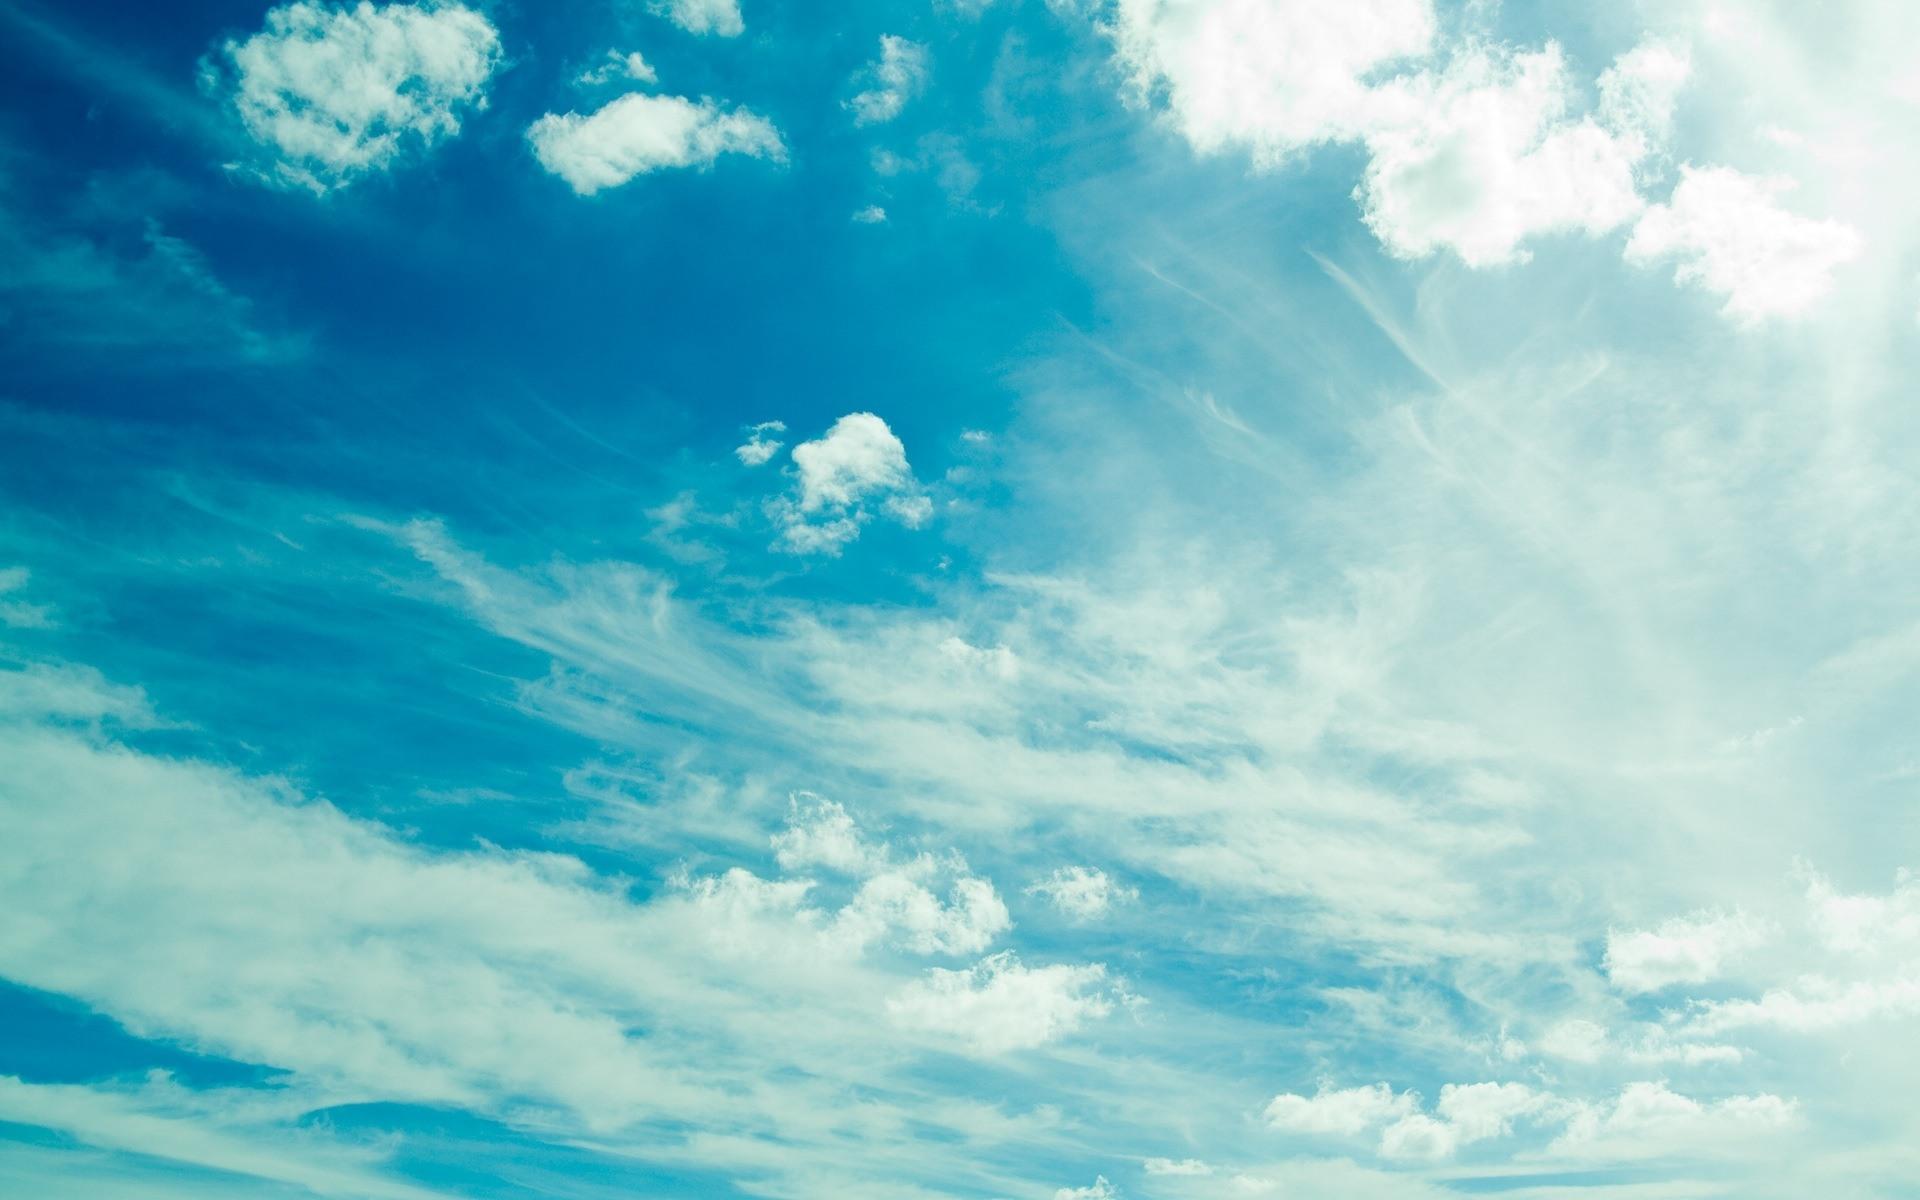 Cloudy Sky Wallpaper 1920x1200